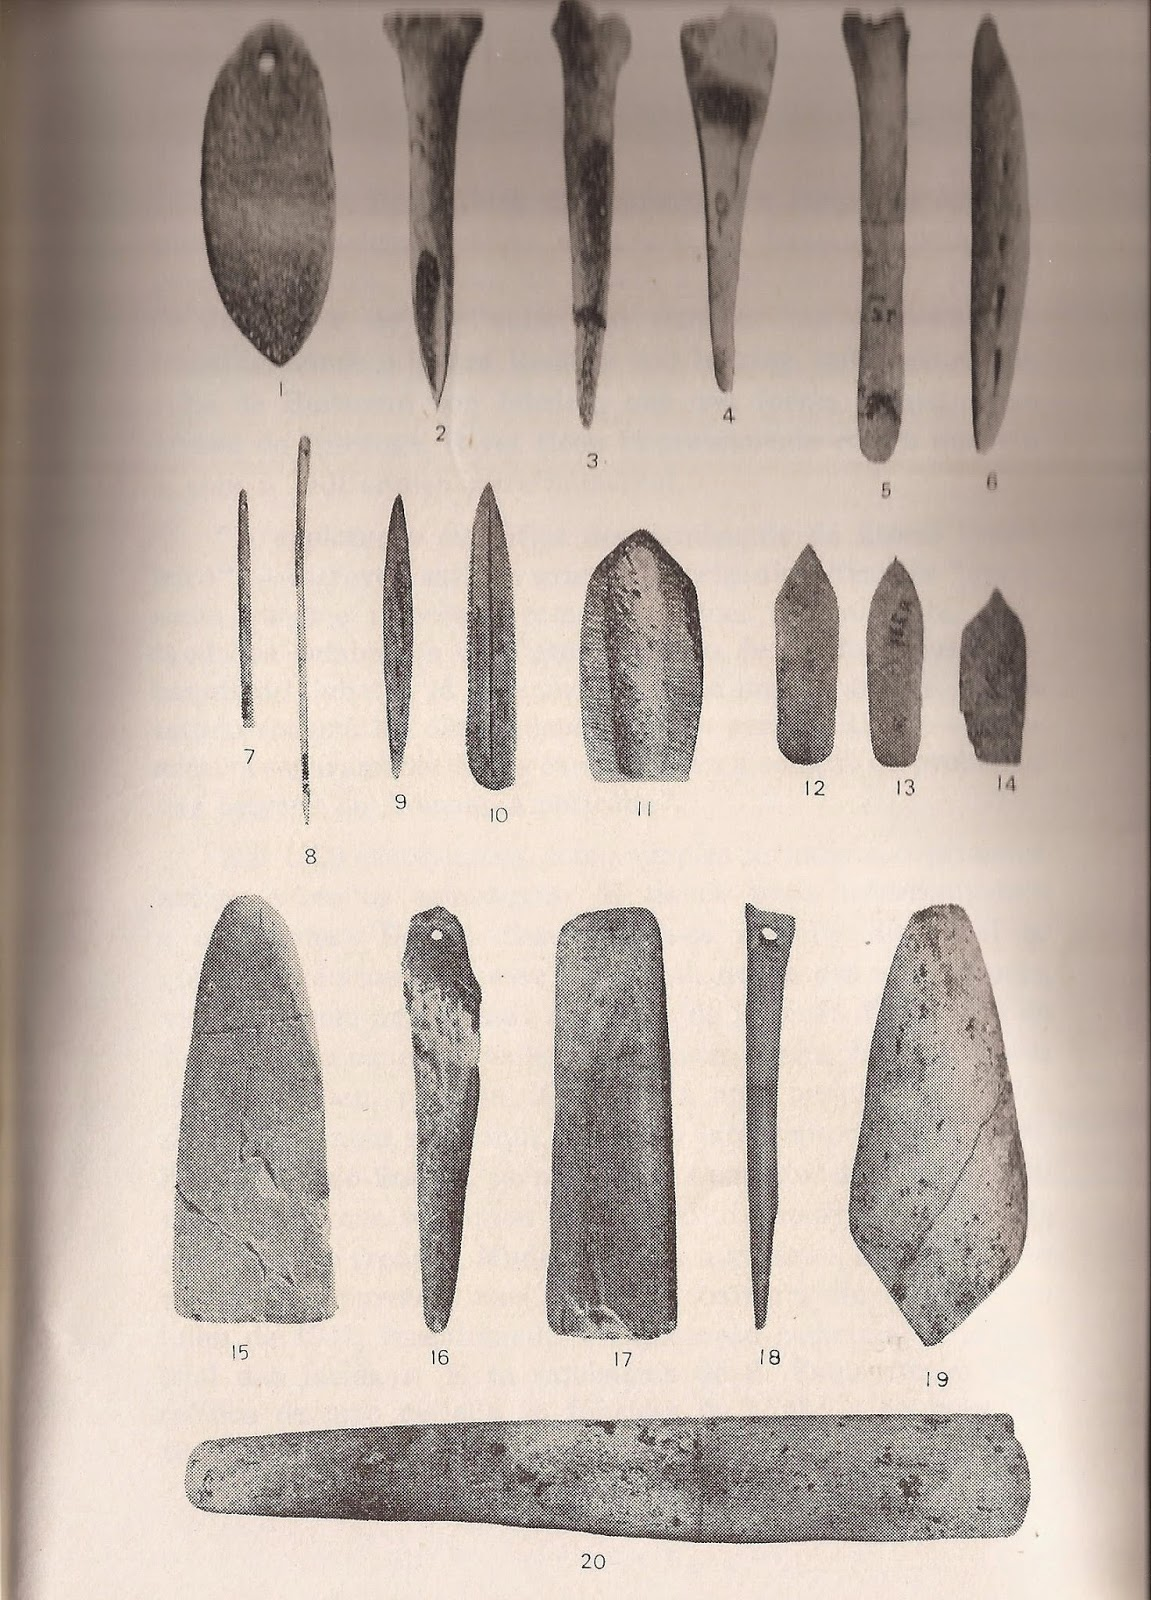 Relatorio arqueologia